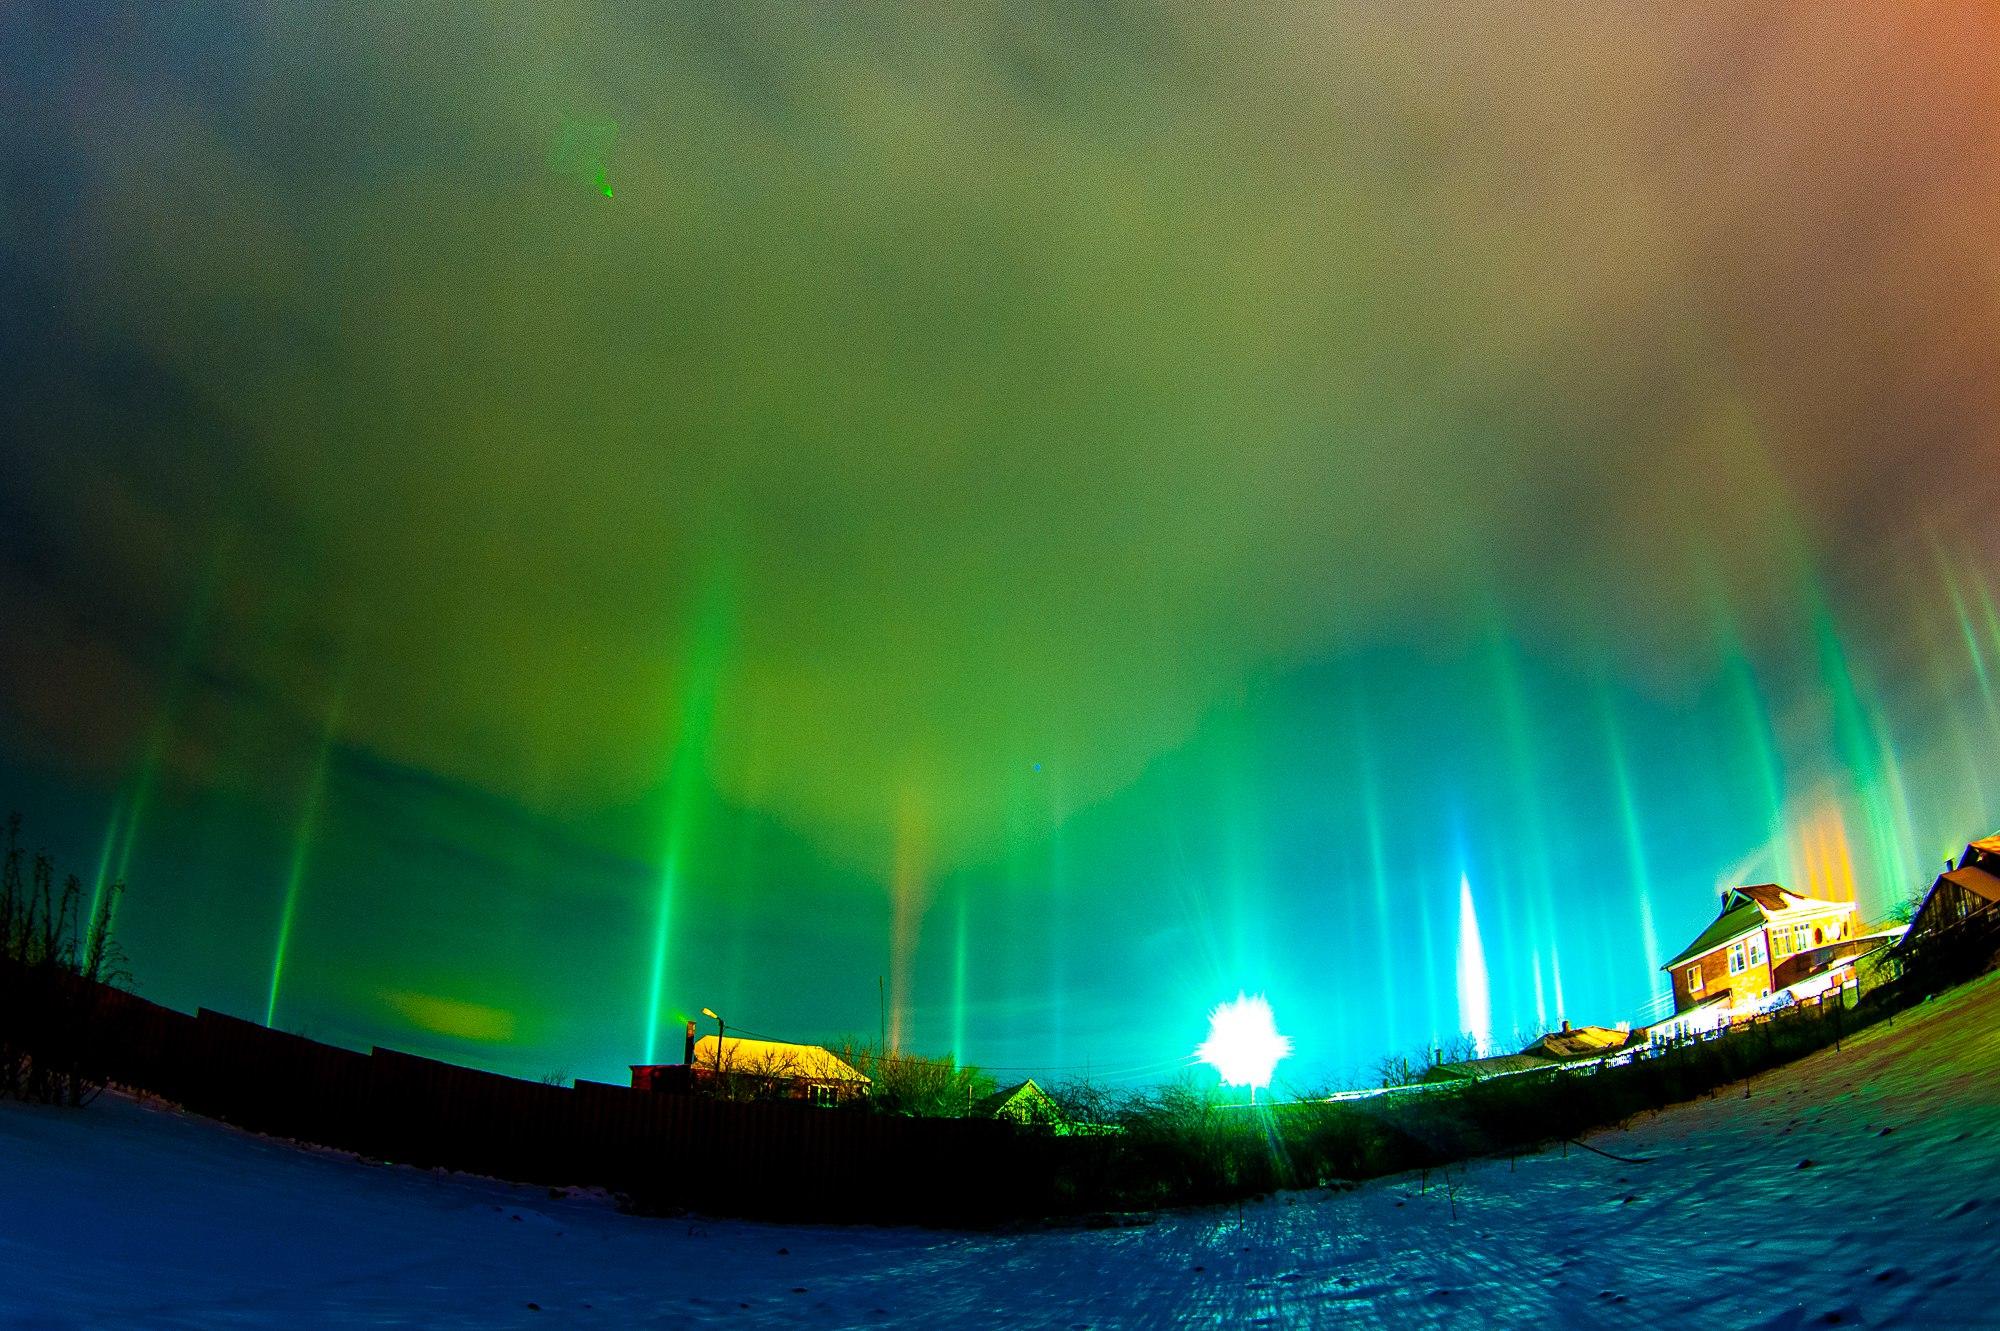 Glowing interdimensional portals open up in the sky of ...  Glowing interdi...